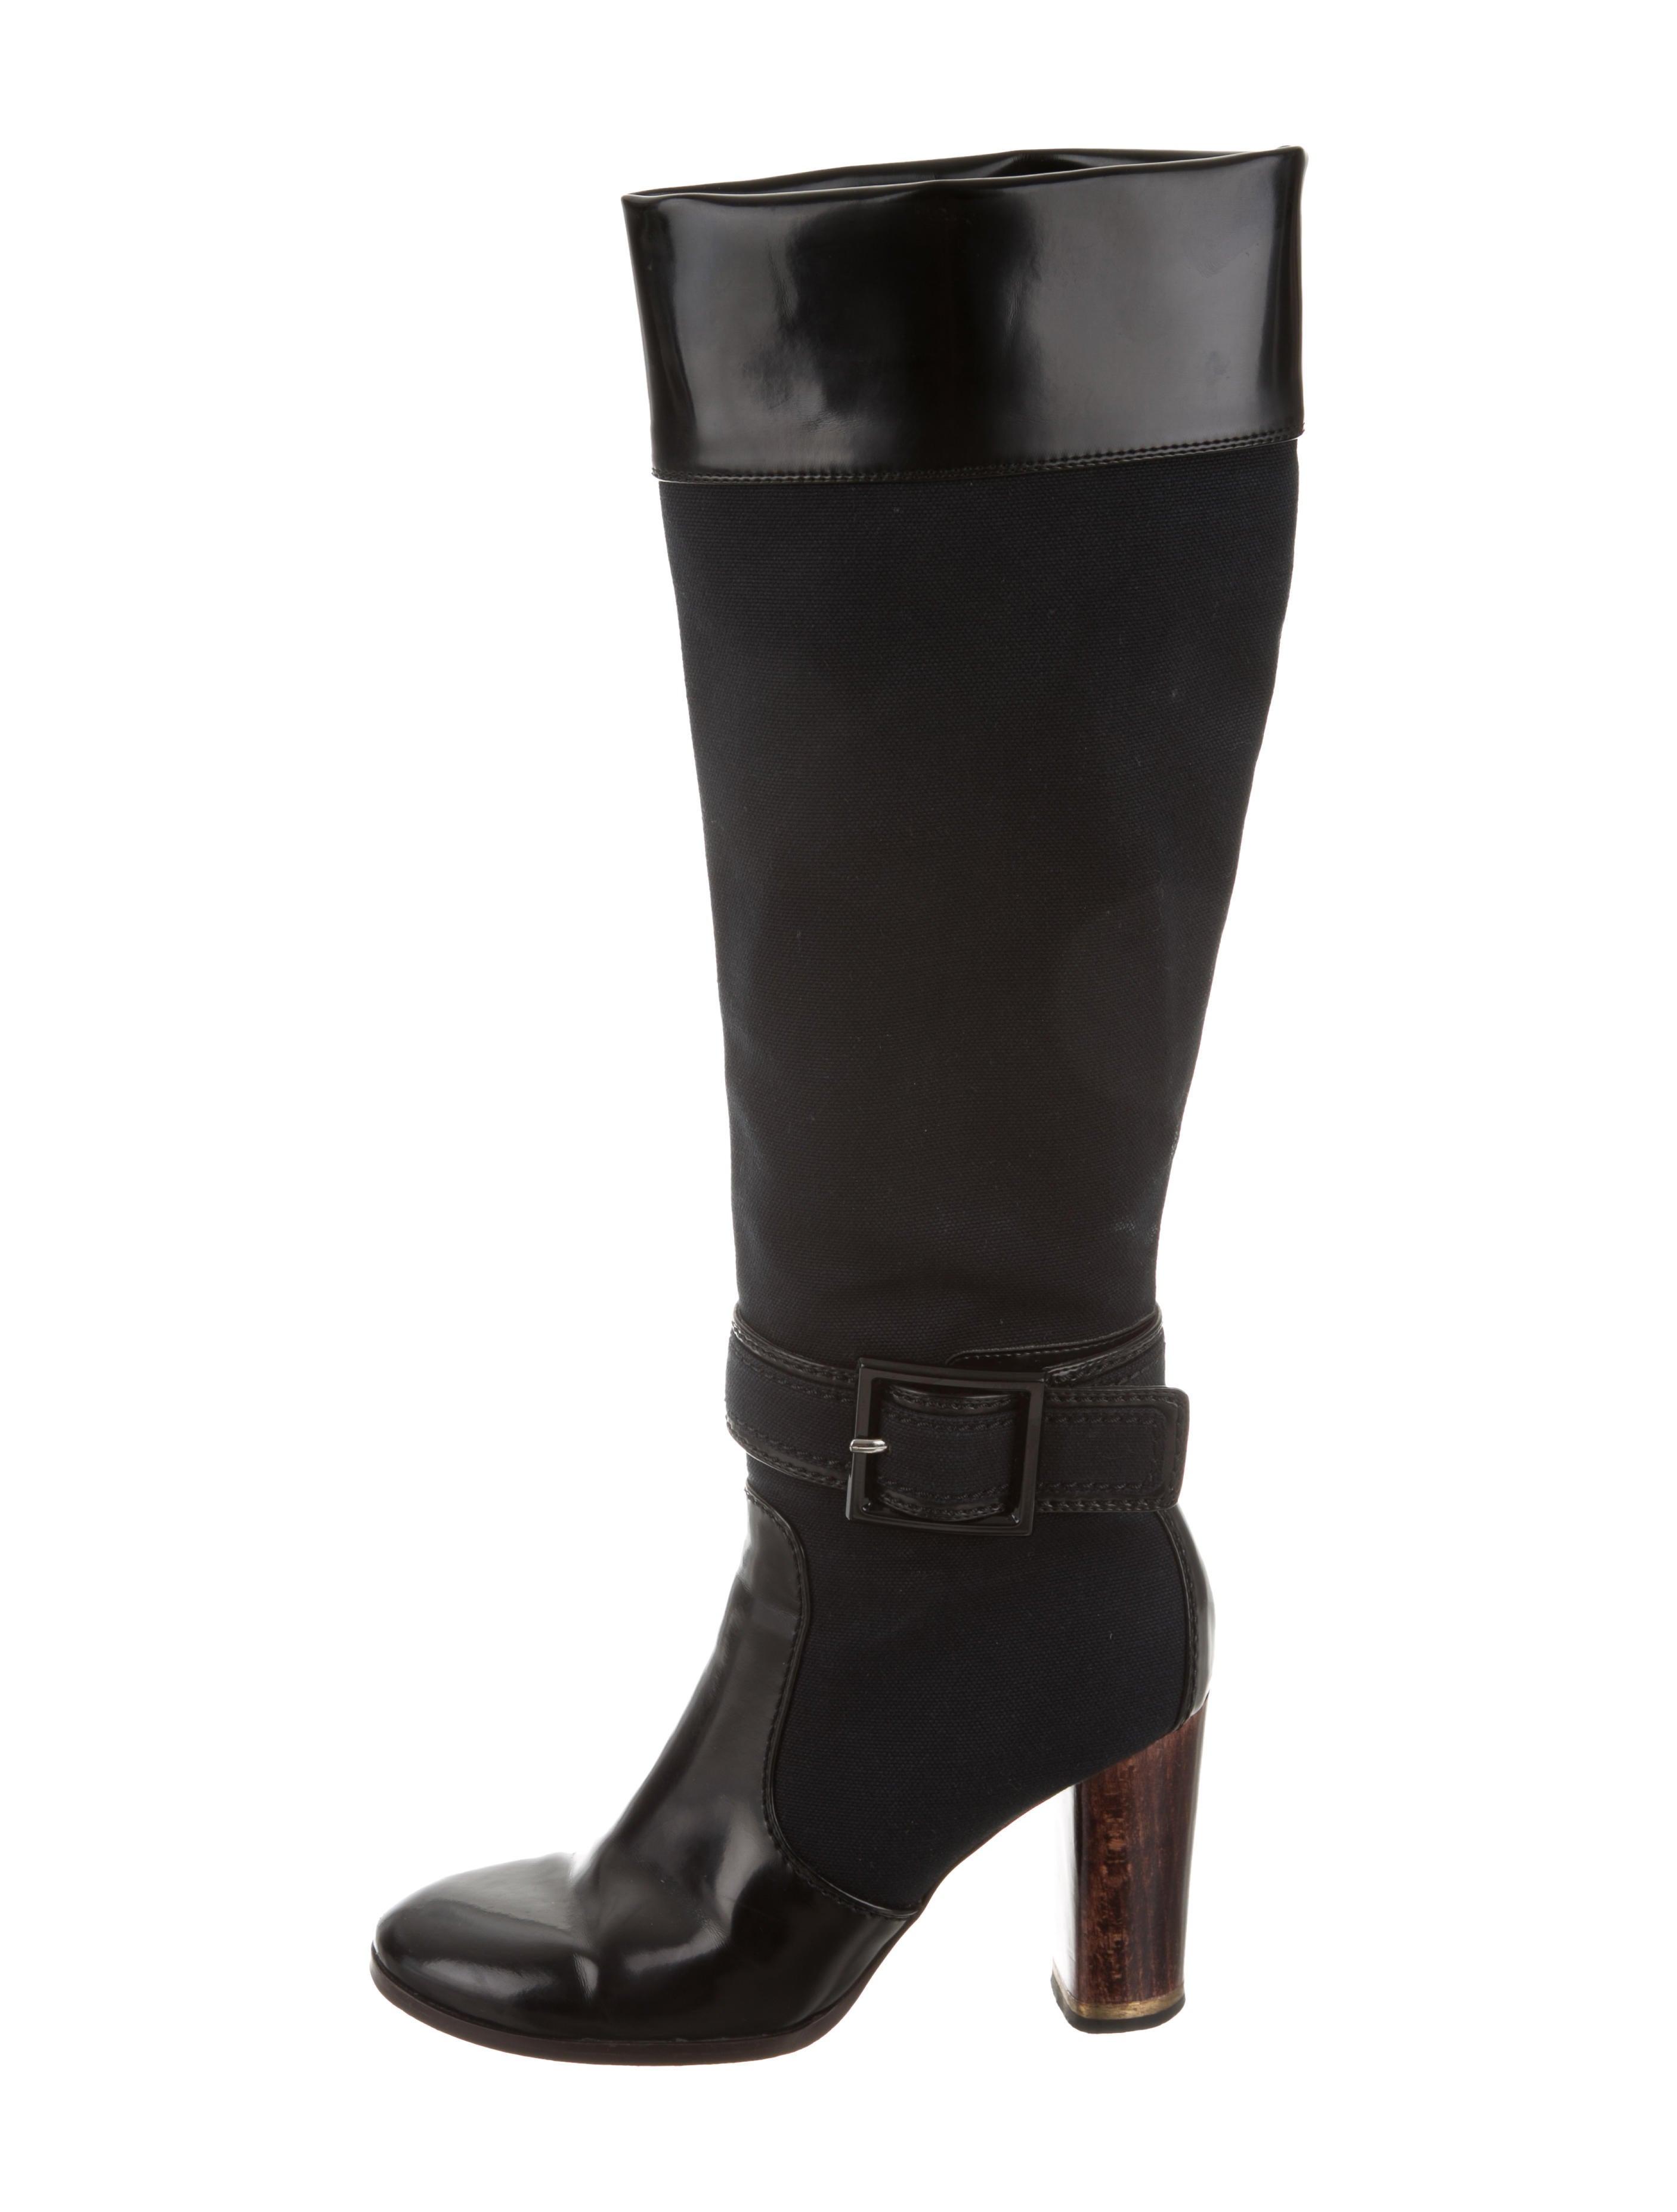 Stella McCartney Vegan Leather-Trimmed Knee-High Boots how much cheap online best wholesale for sale 2014 unisex cheap online brand new unisex cheap price ttKll